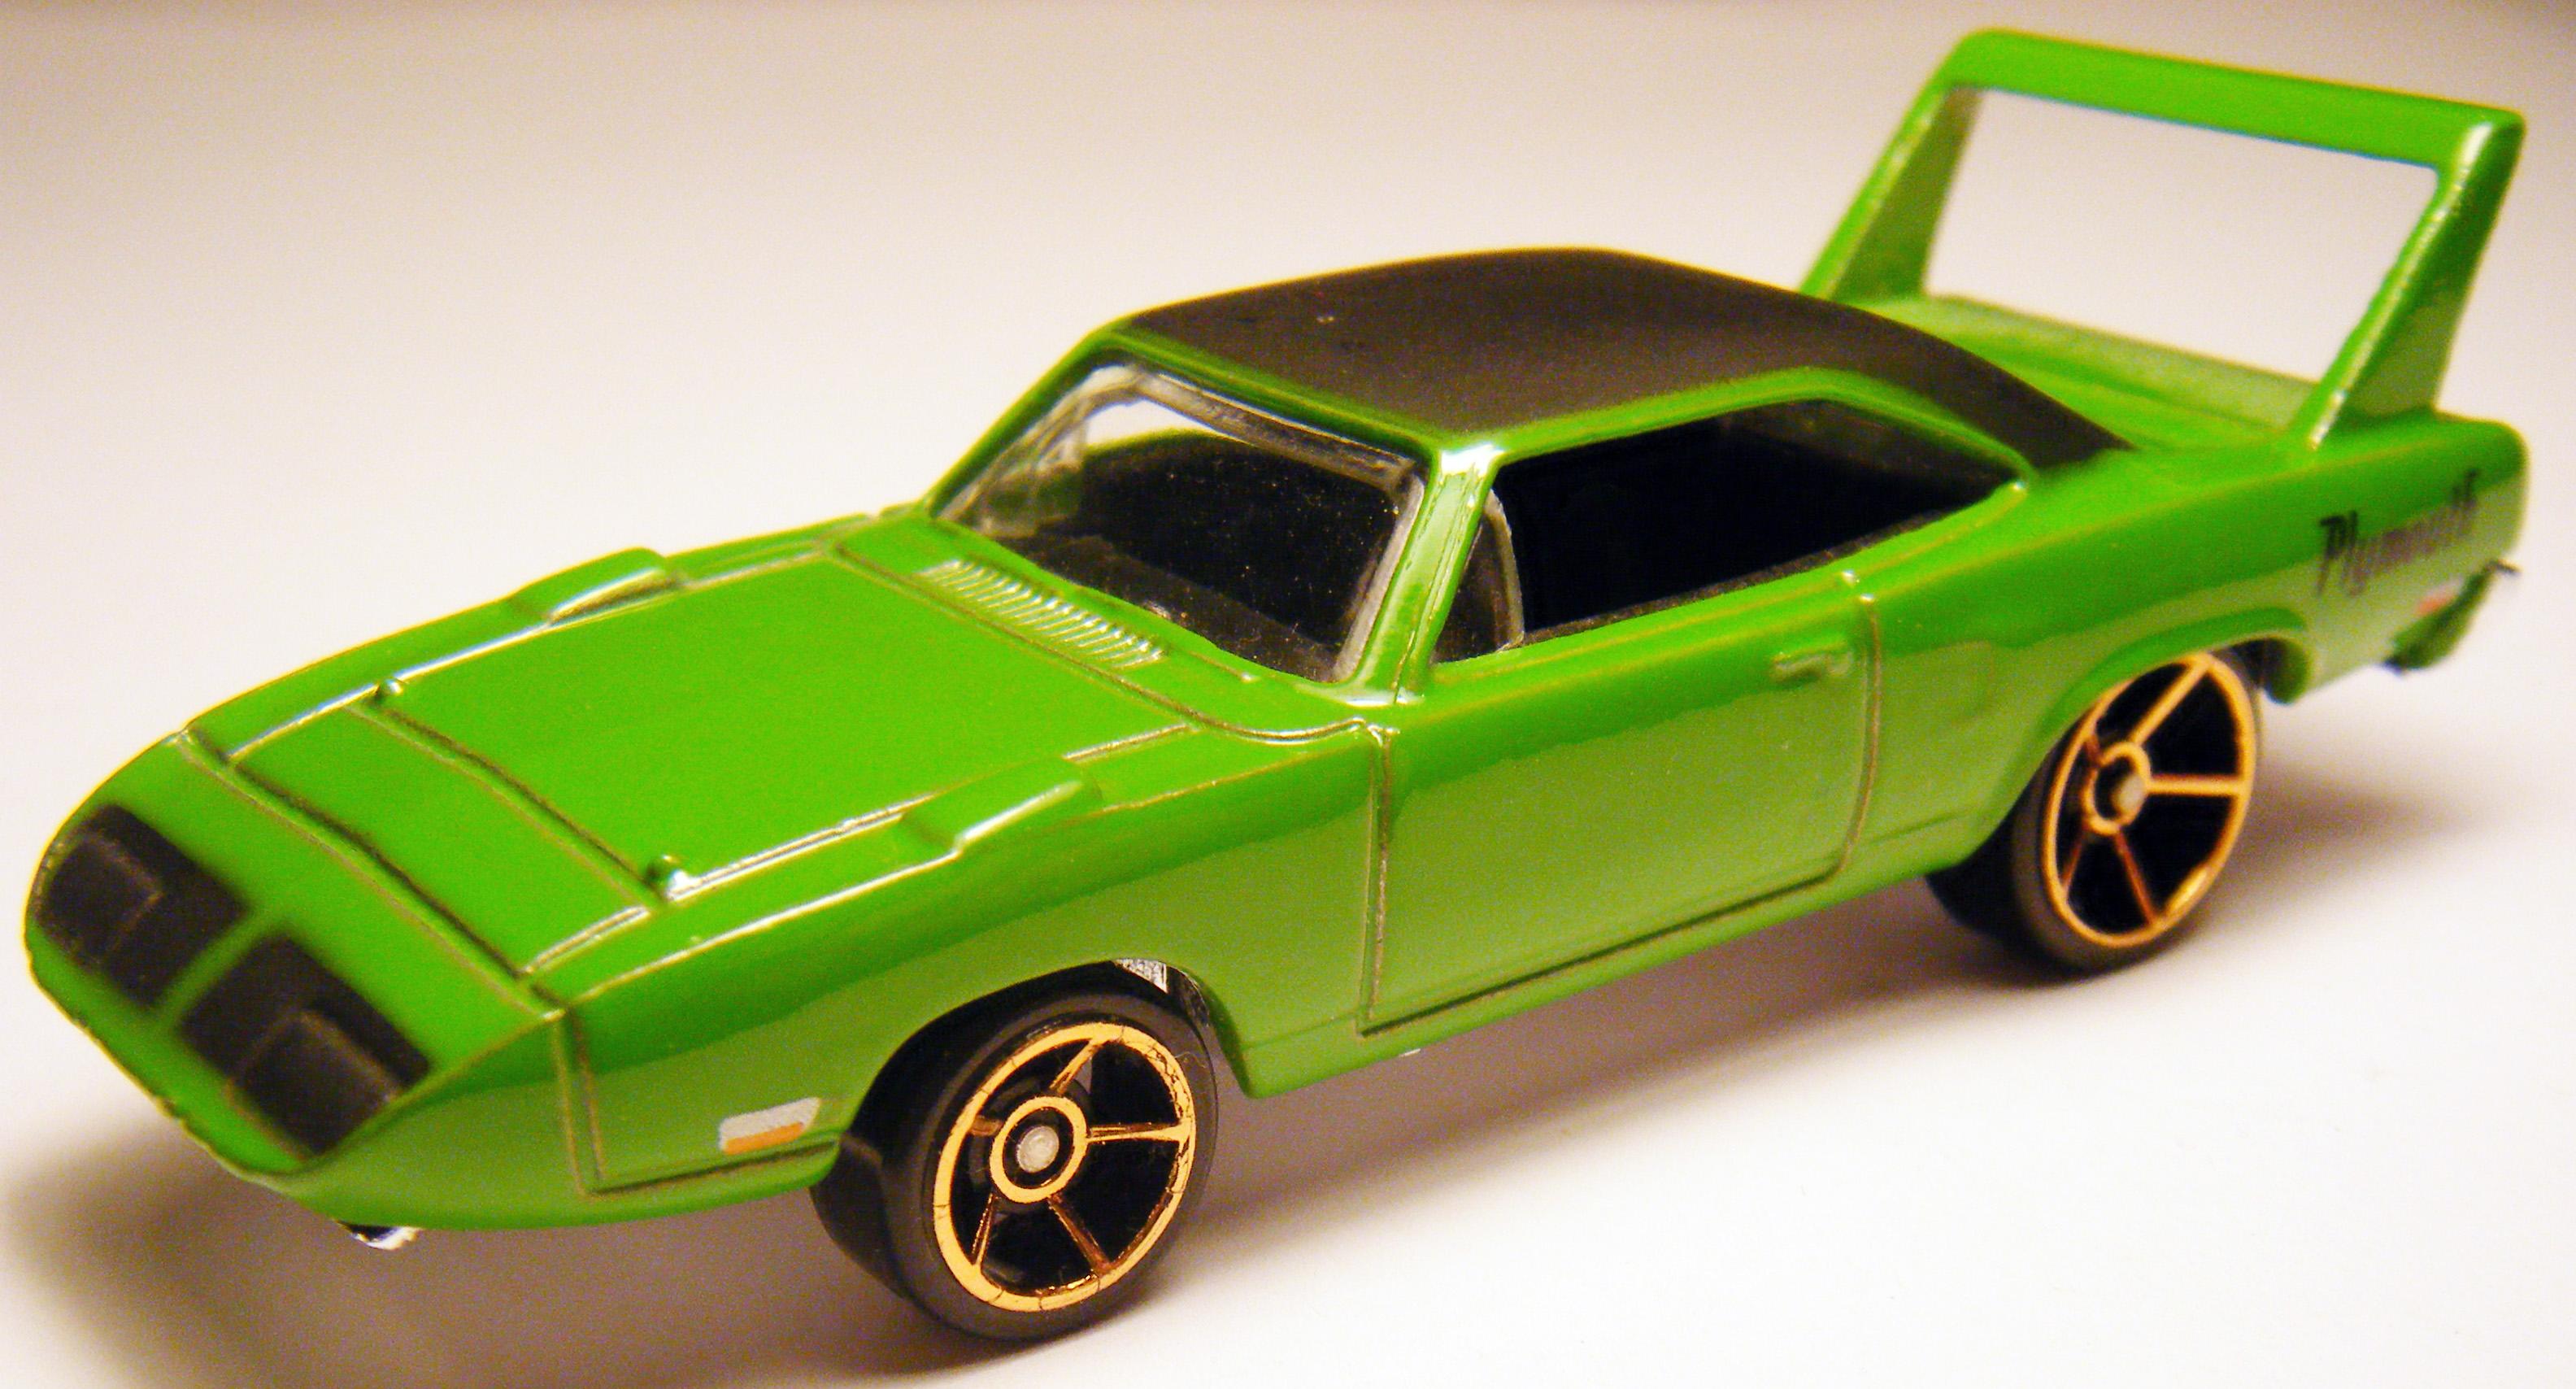 70 Plymouth Superbird | Hot Wheels Wiki | FANDOM powered by Wikia